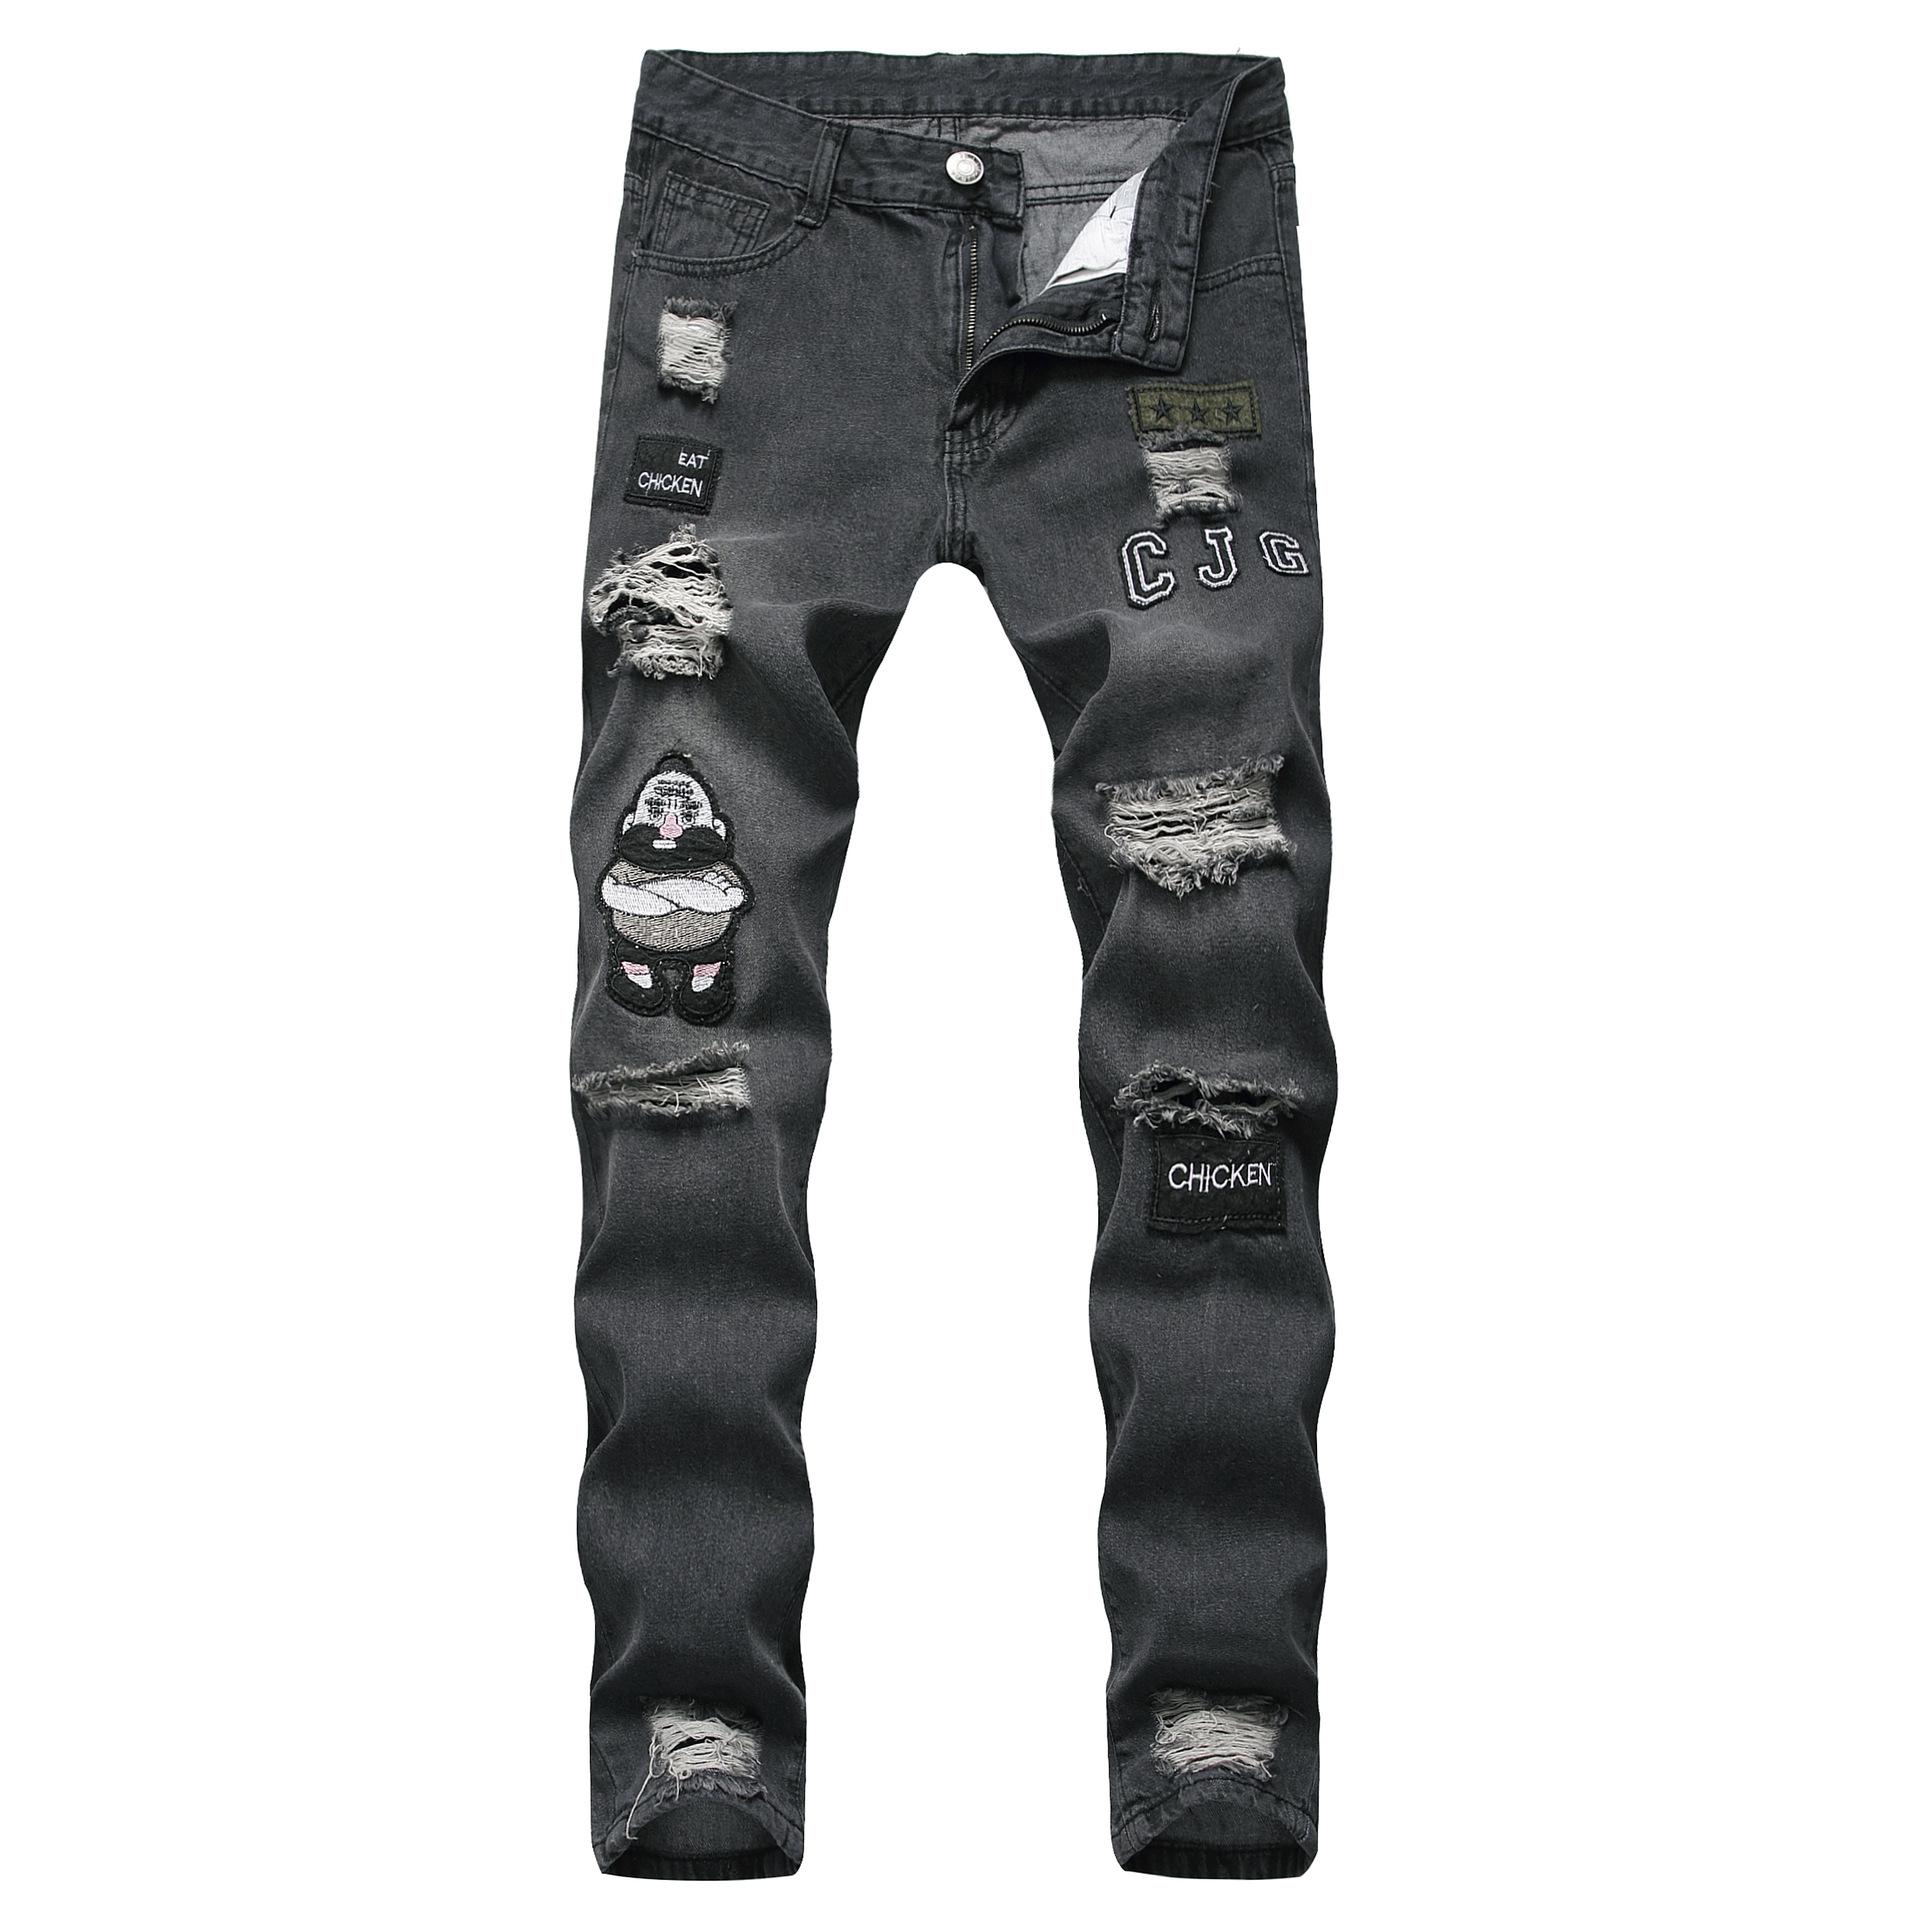 Hip Hop Style Worn Out Pencil Jeans For Men